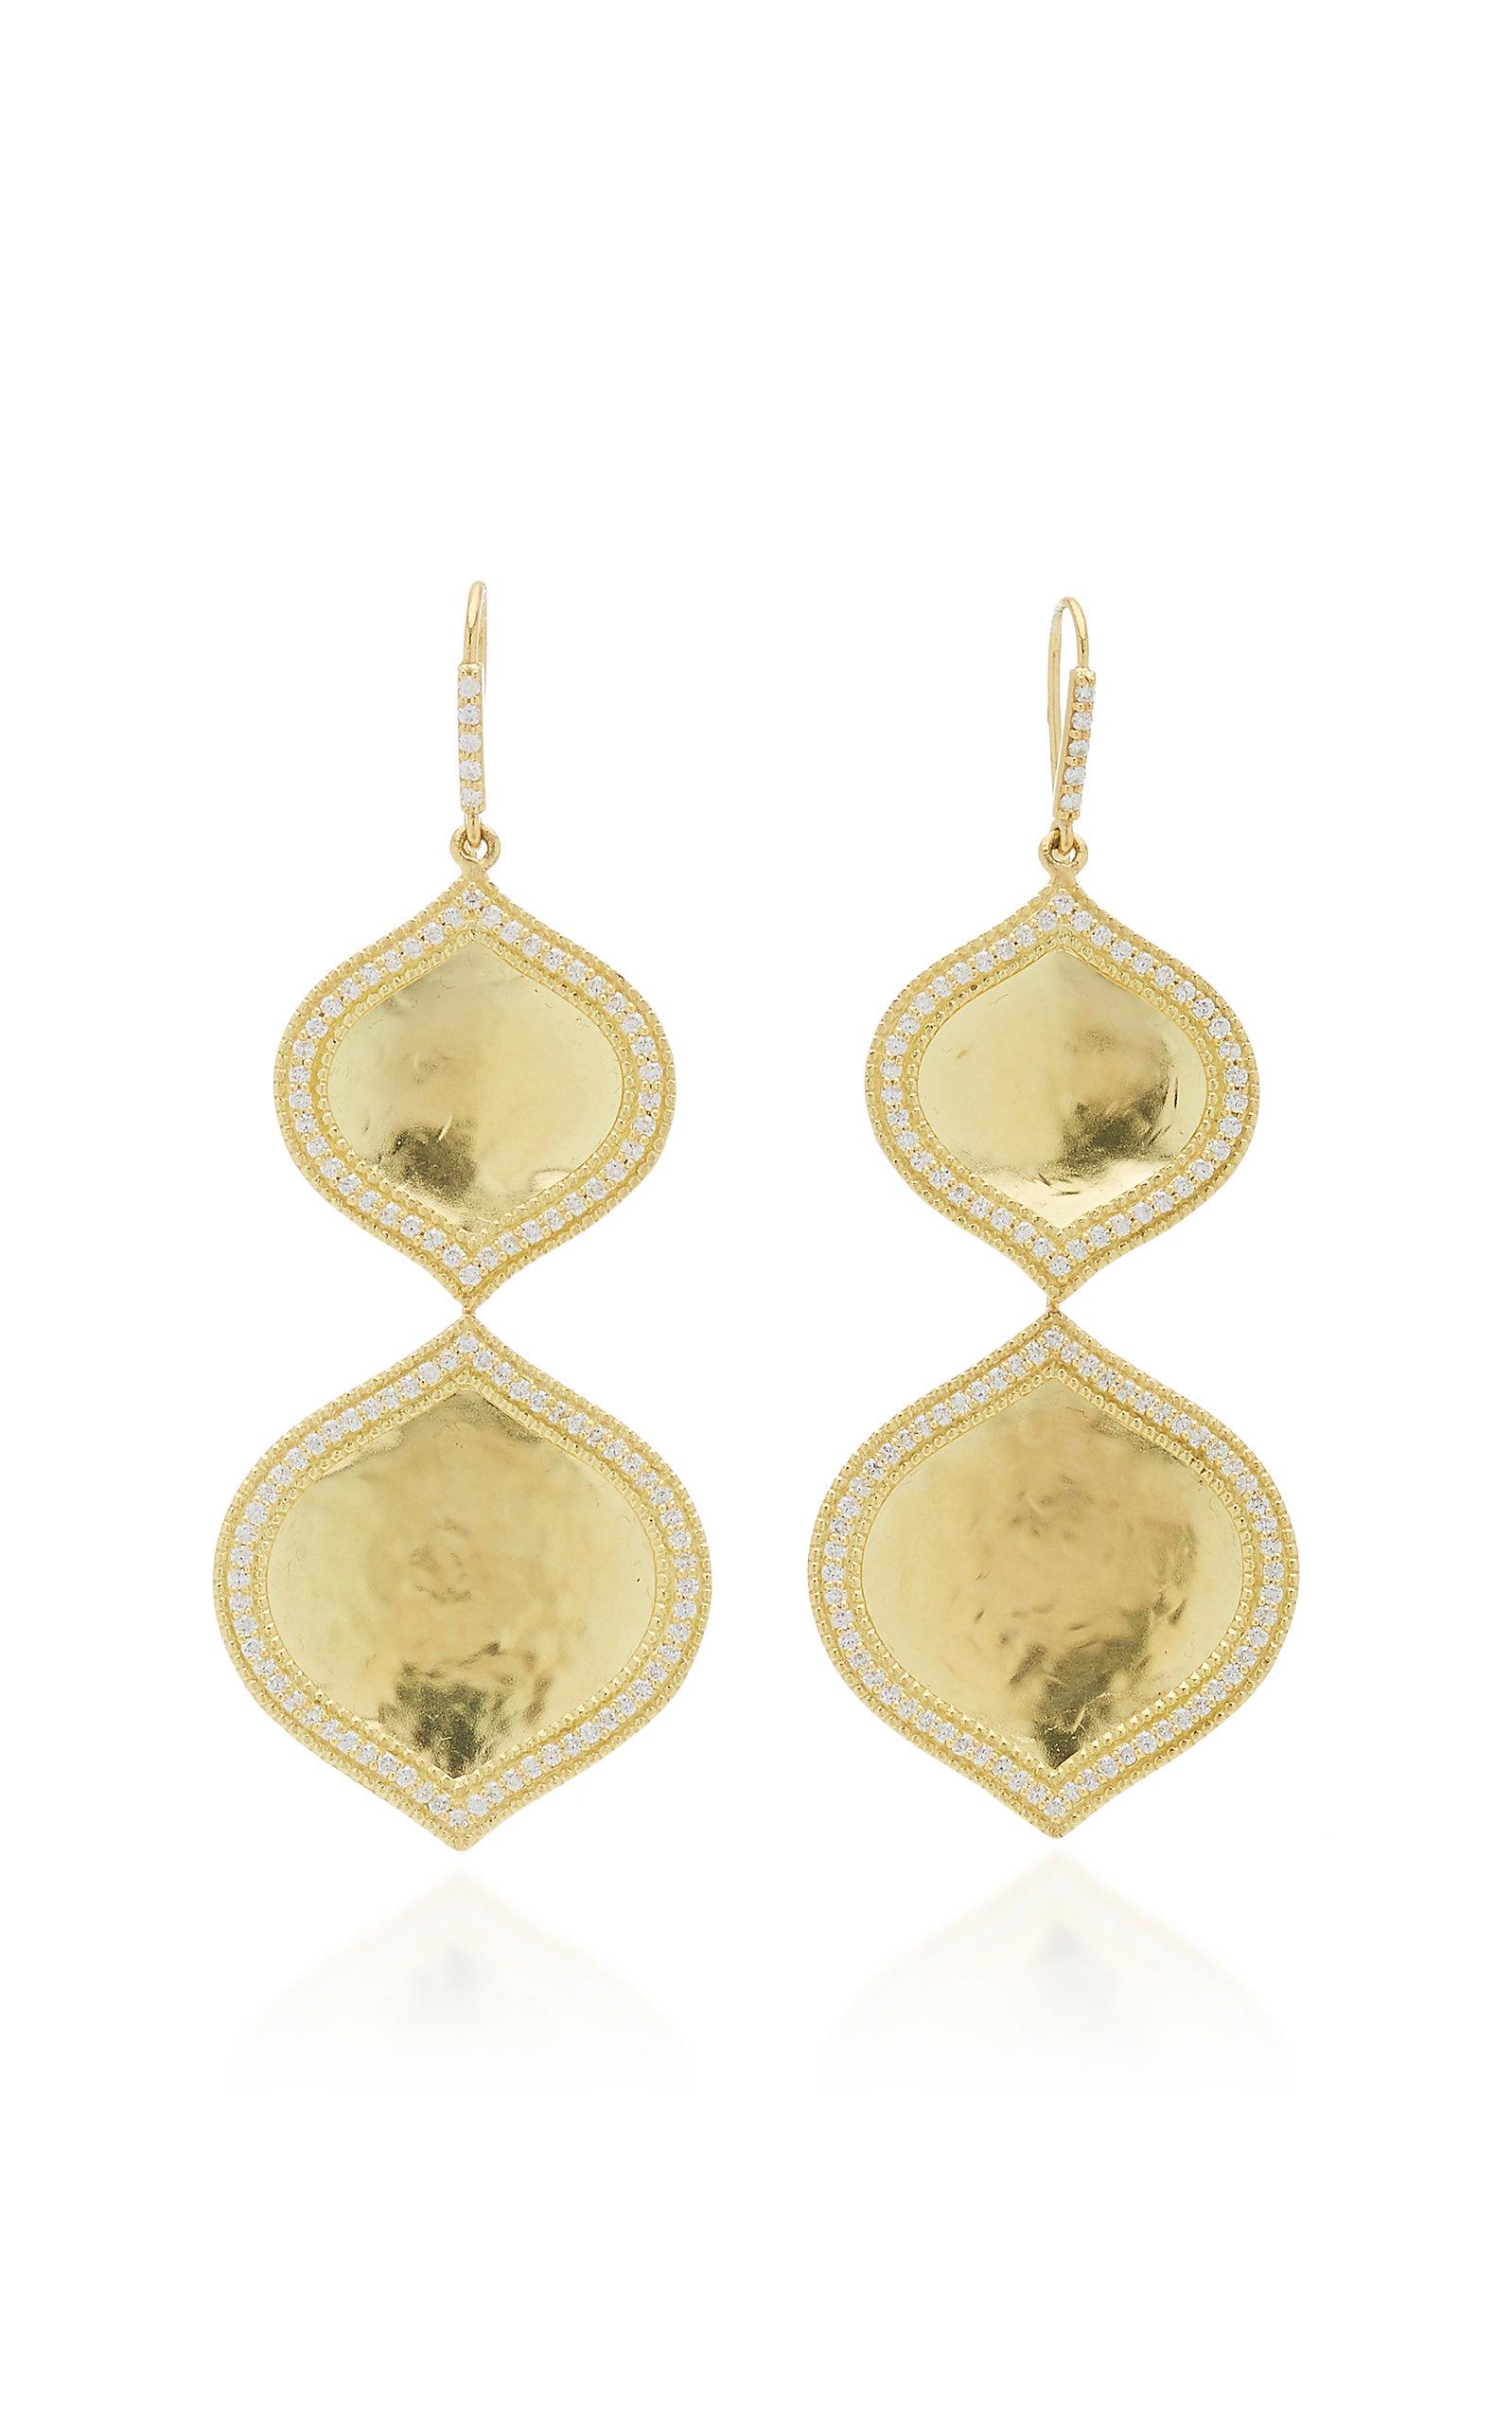 Women's Double Pallavi 18k Yellow-Gold and Diamond Drop Earrings